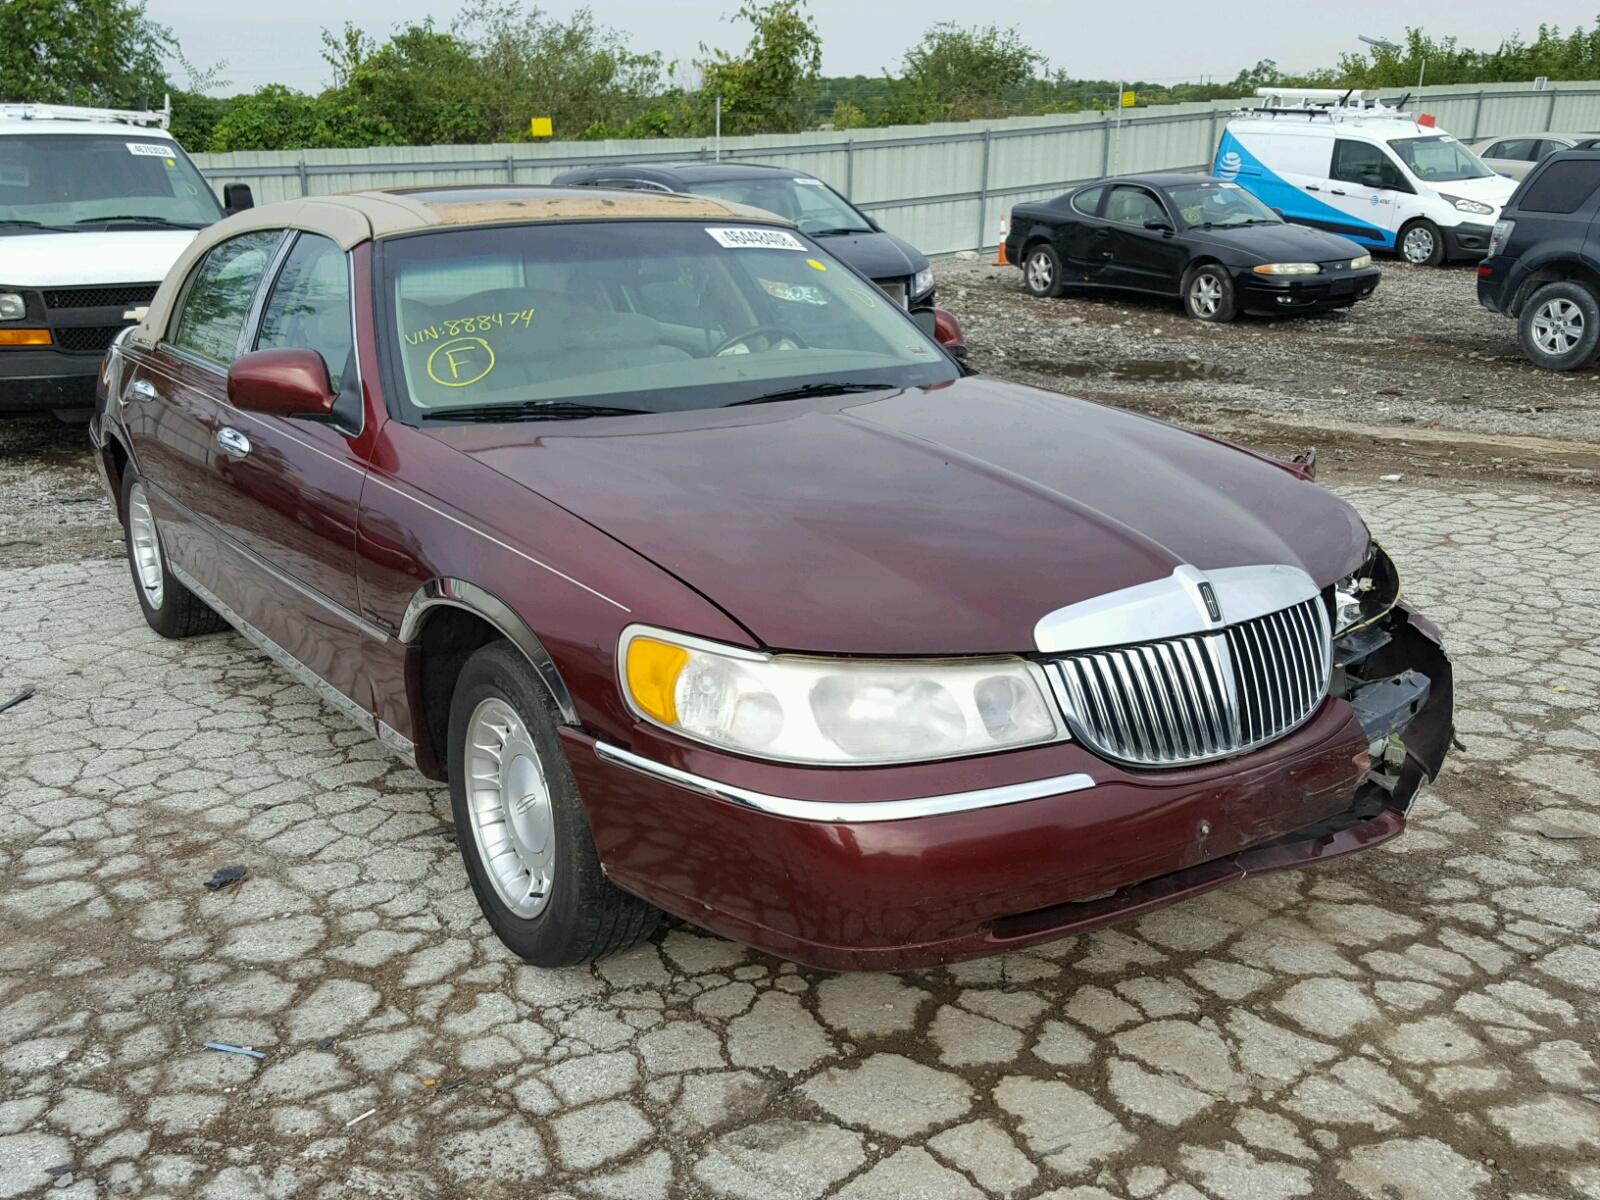 2000 Lincoln Town Car C For Sale At Copart Kansas City Ks Lot 46448408